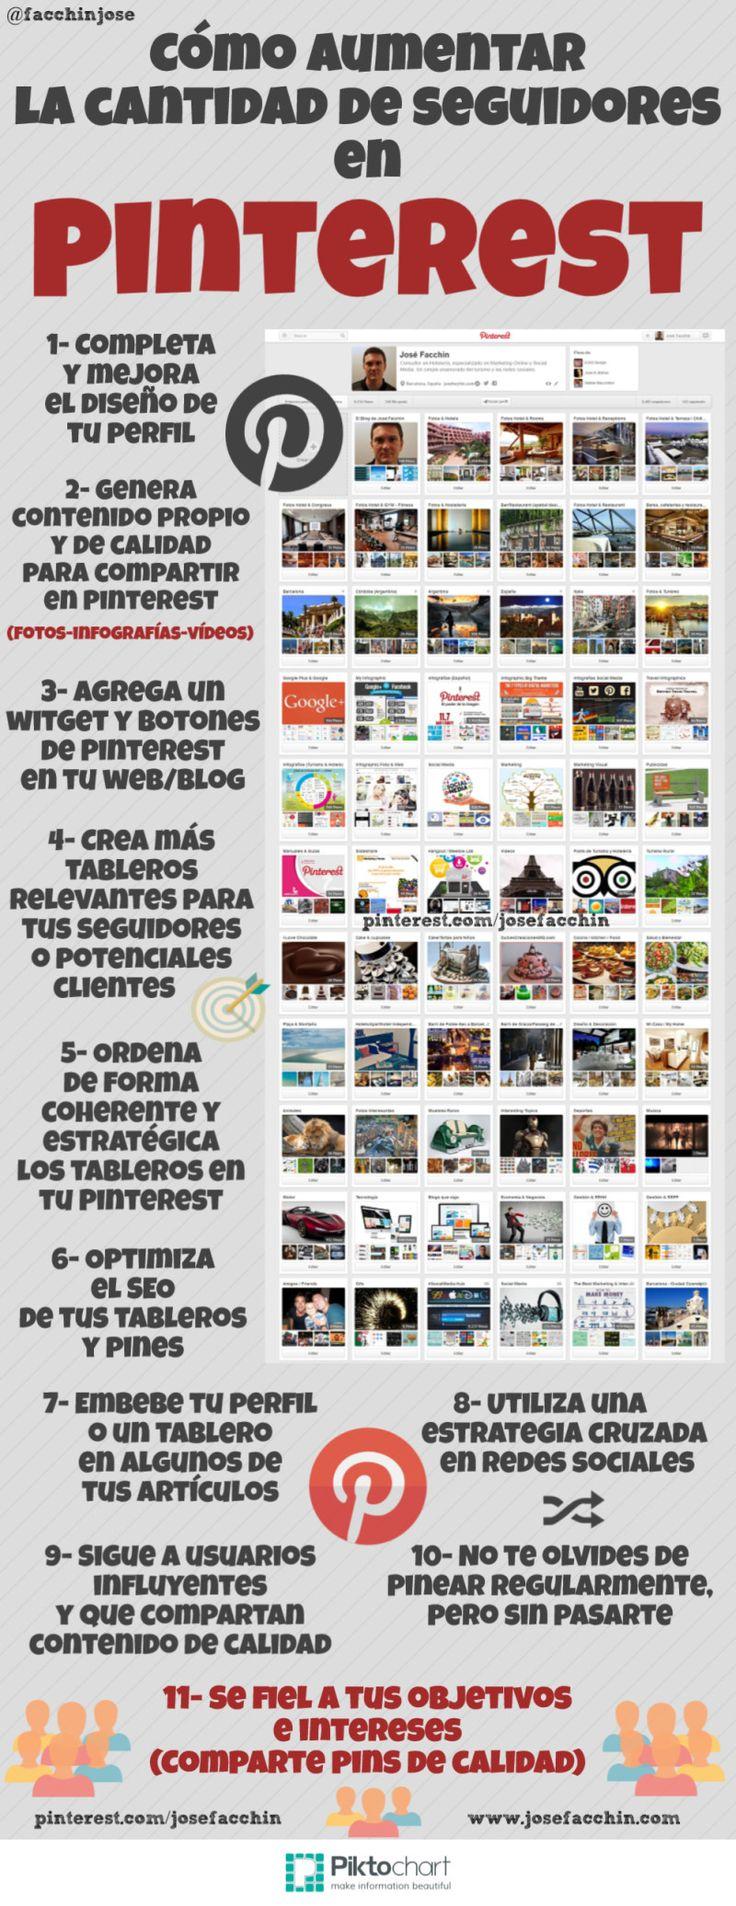 11 maneras de conseguir más seguidores en #Pinterest #infografía